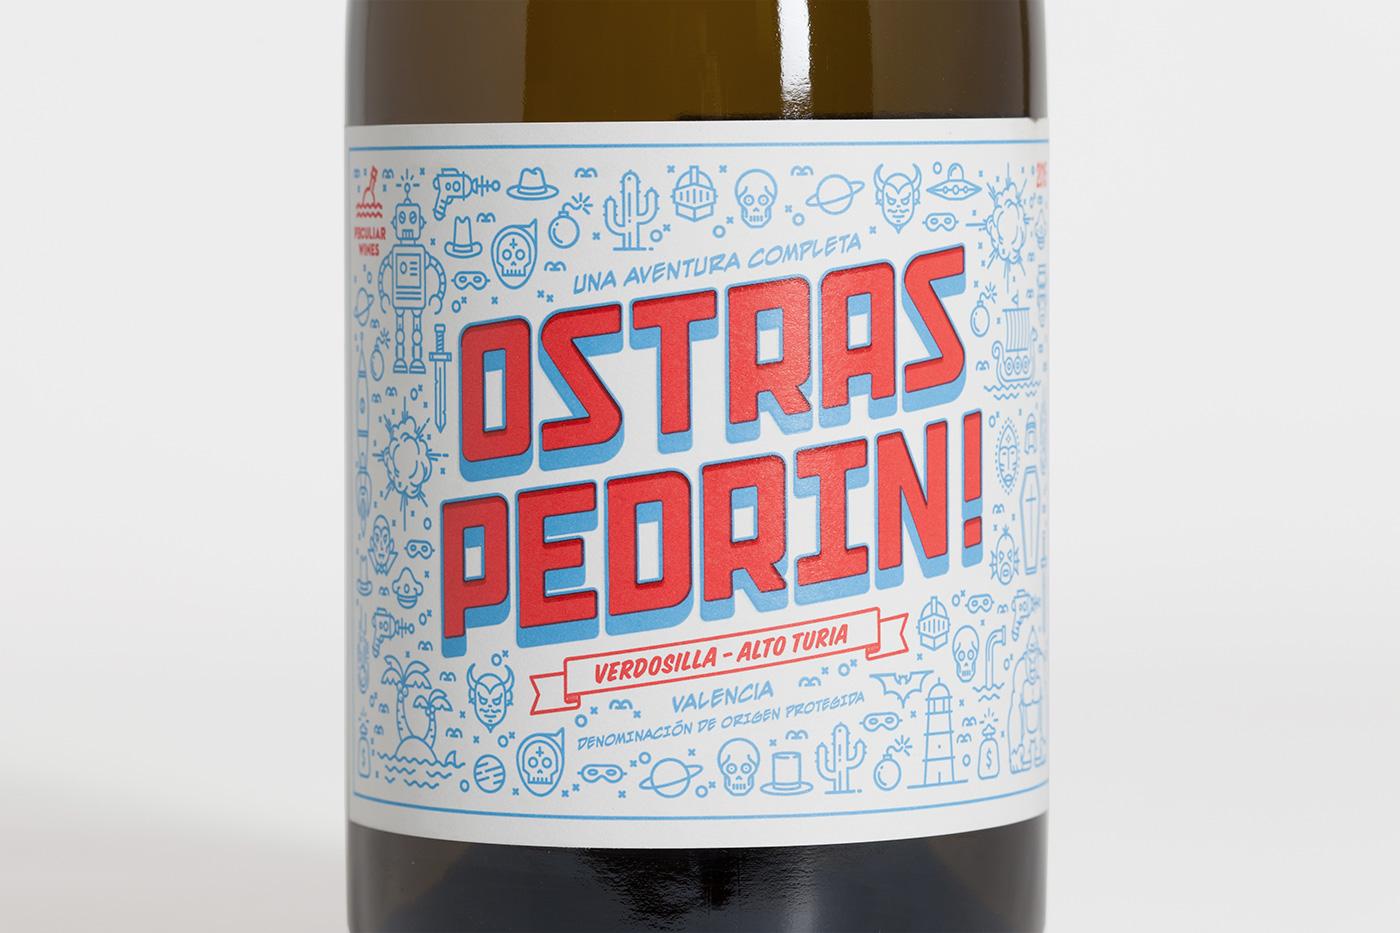 pixelarte-diseno-grafico-etiqueta-botella-de-vino-Ostras_pedrin-Bodega-Vicente_Gandia